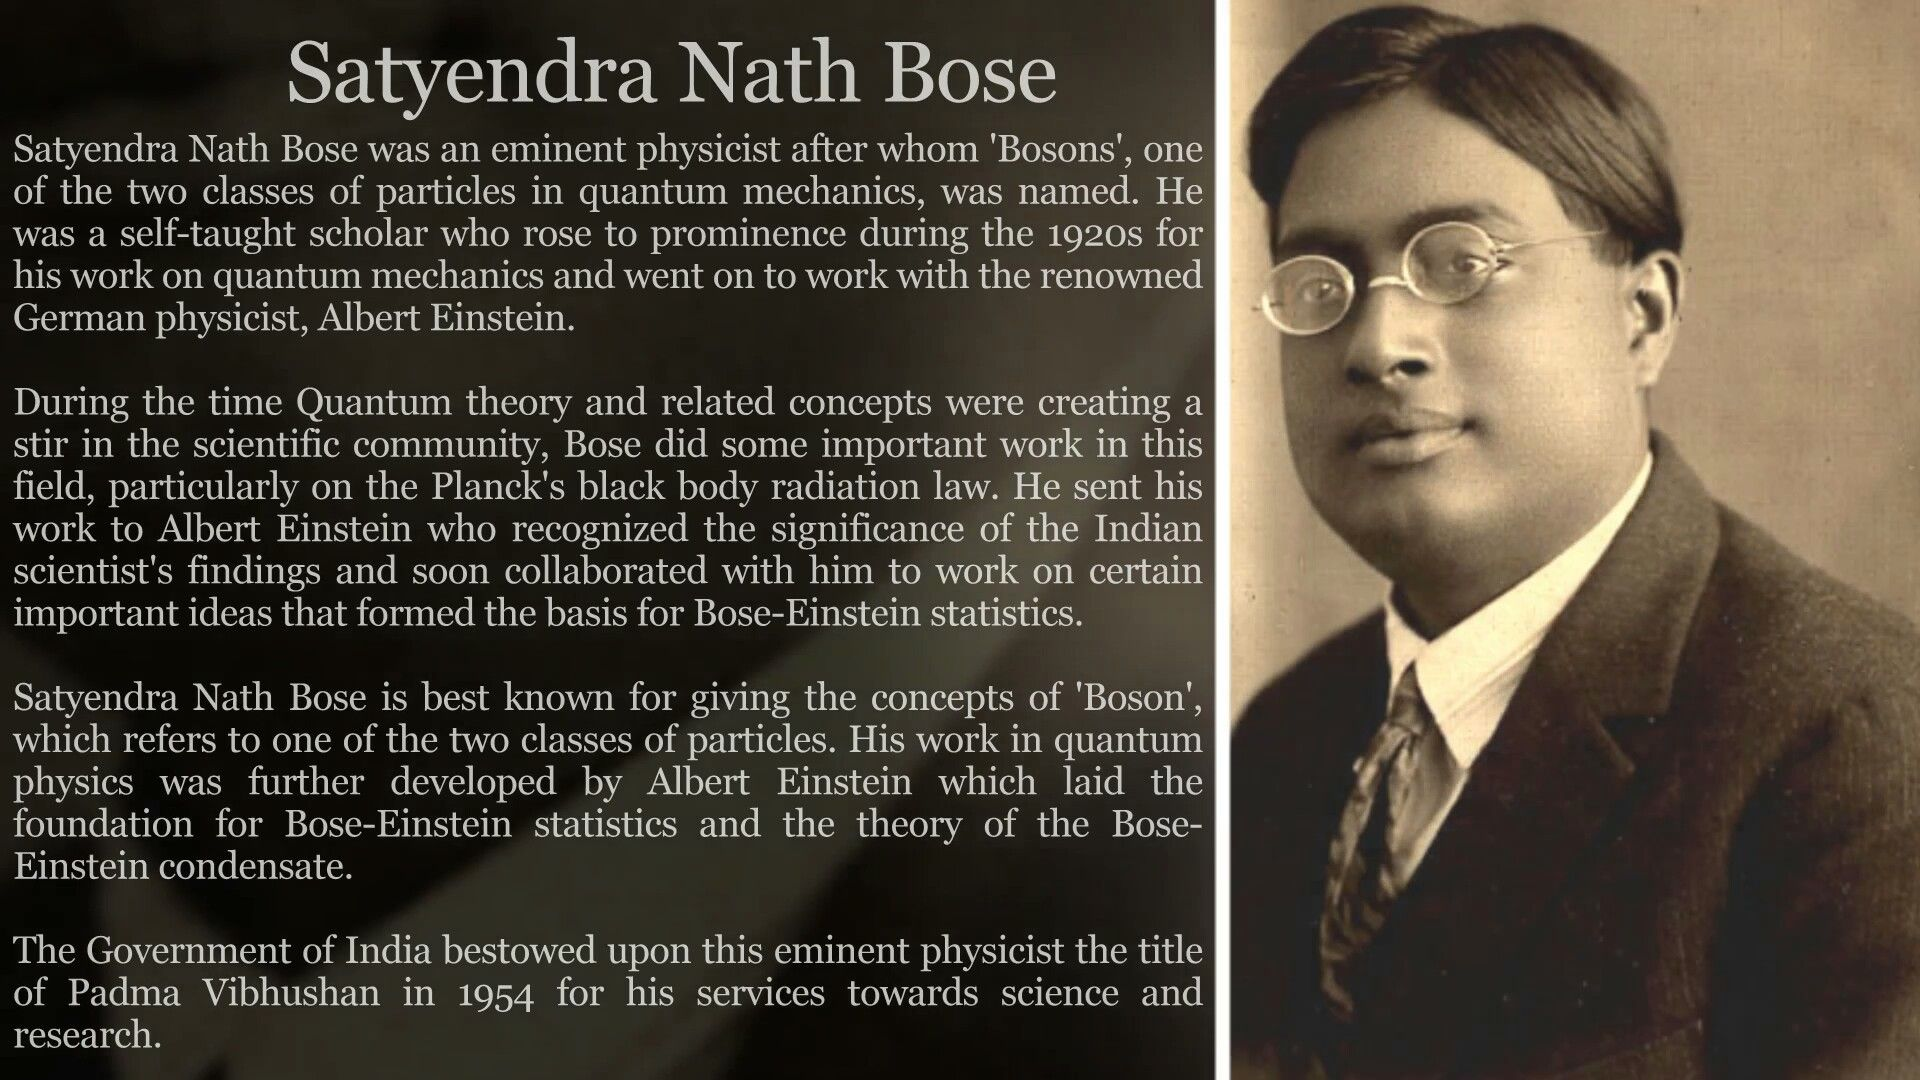 a short essay on satyendra nath bose